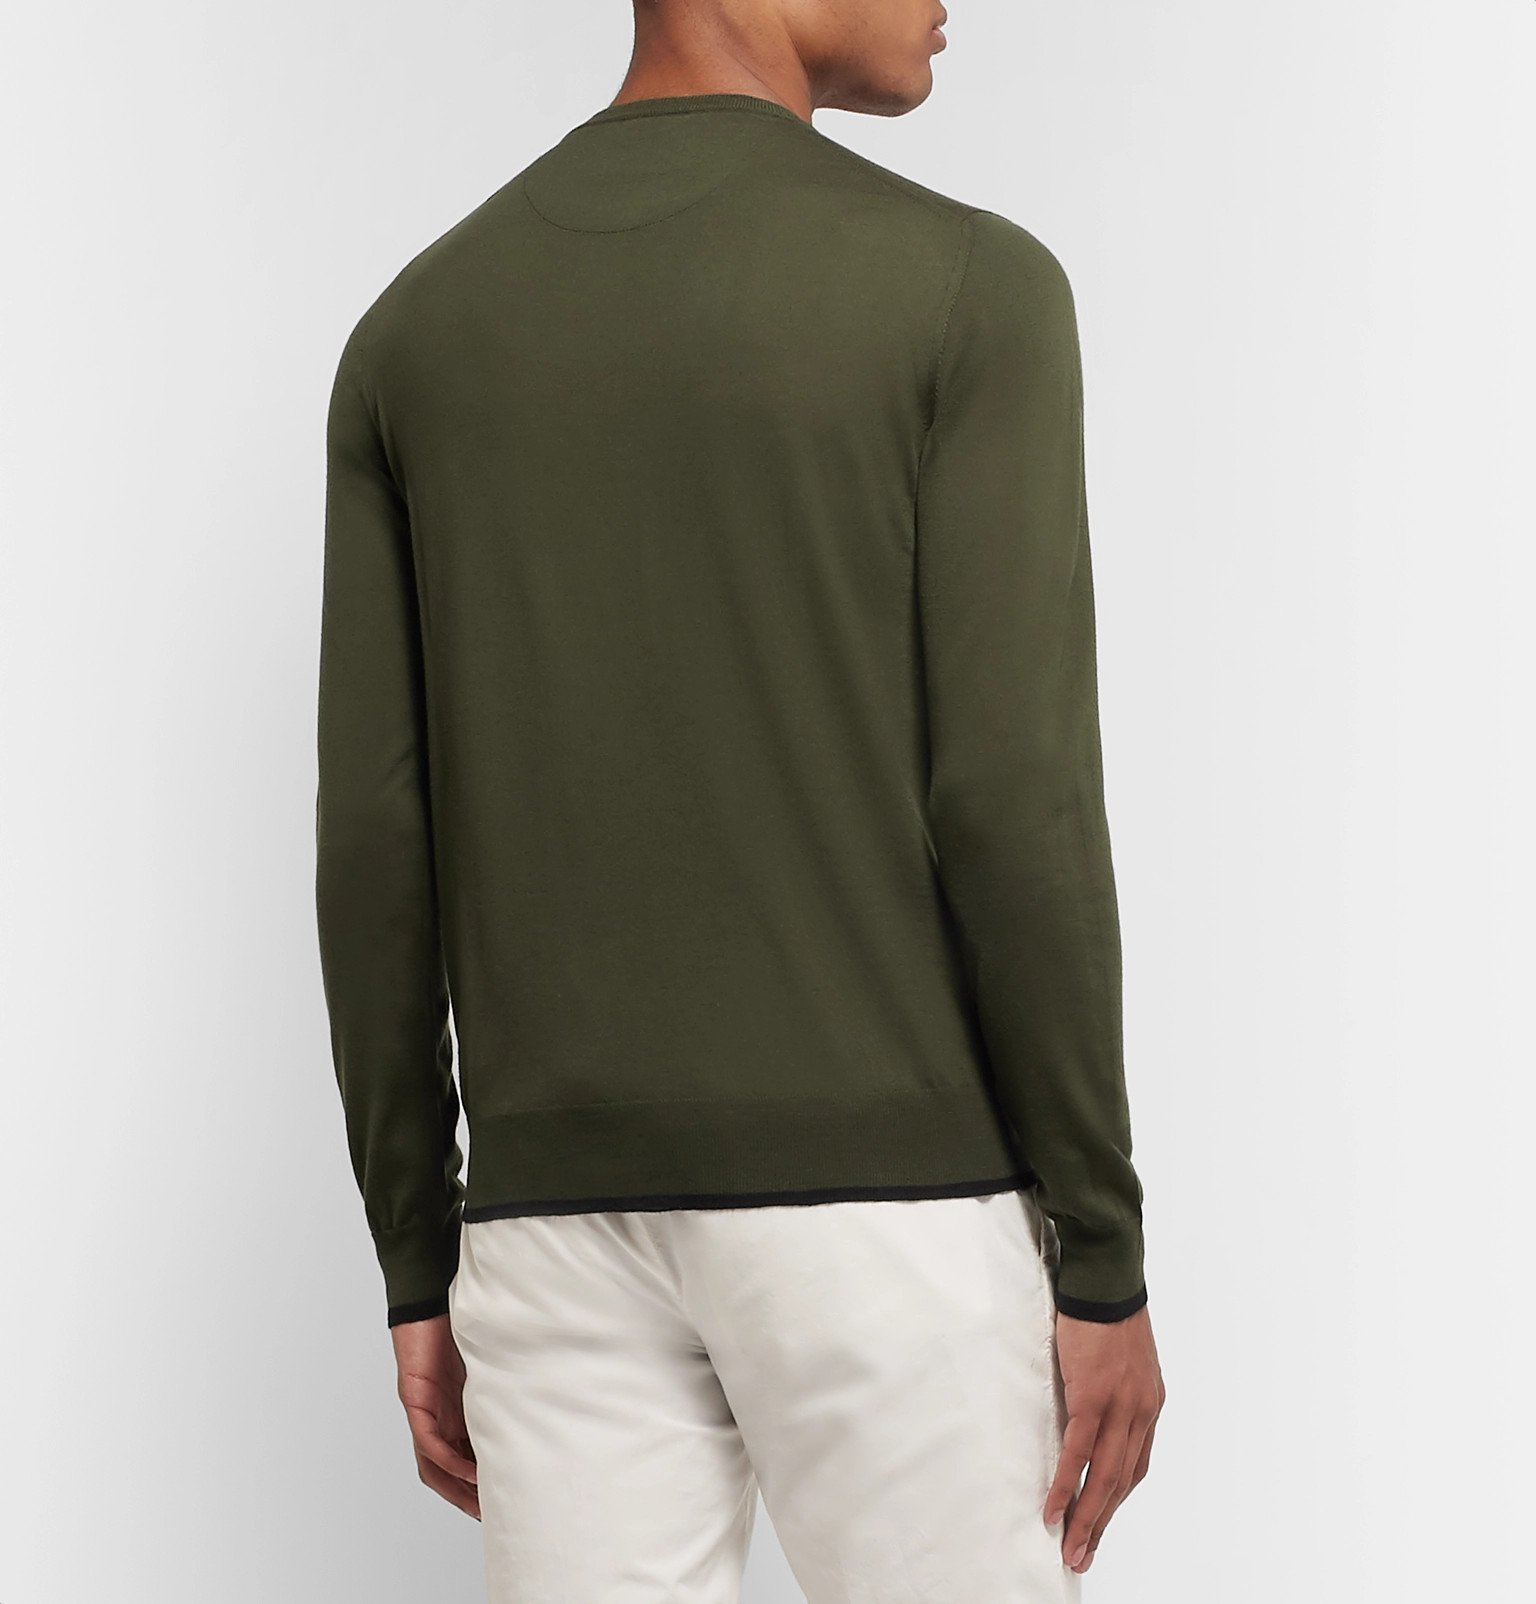 Tod's - Merino Wool Sweater - Green